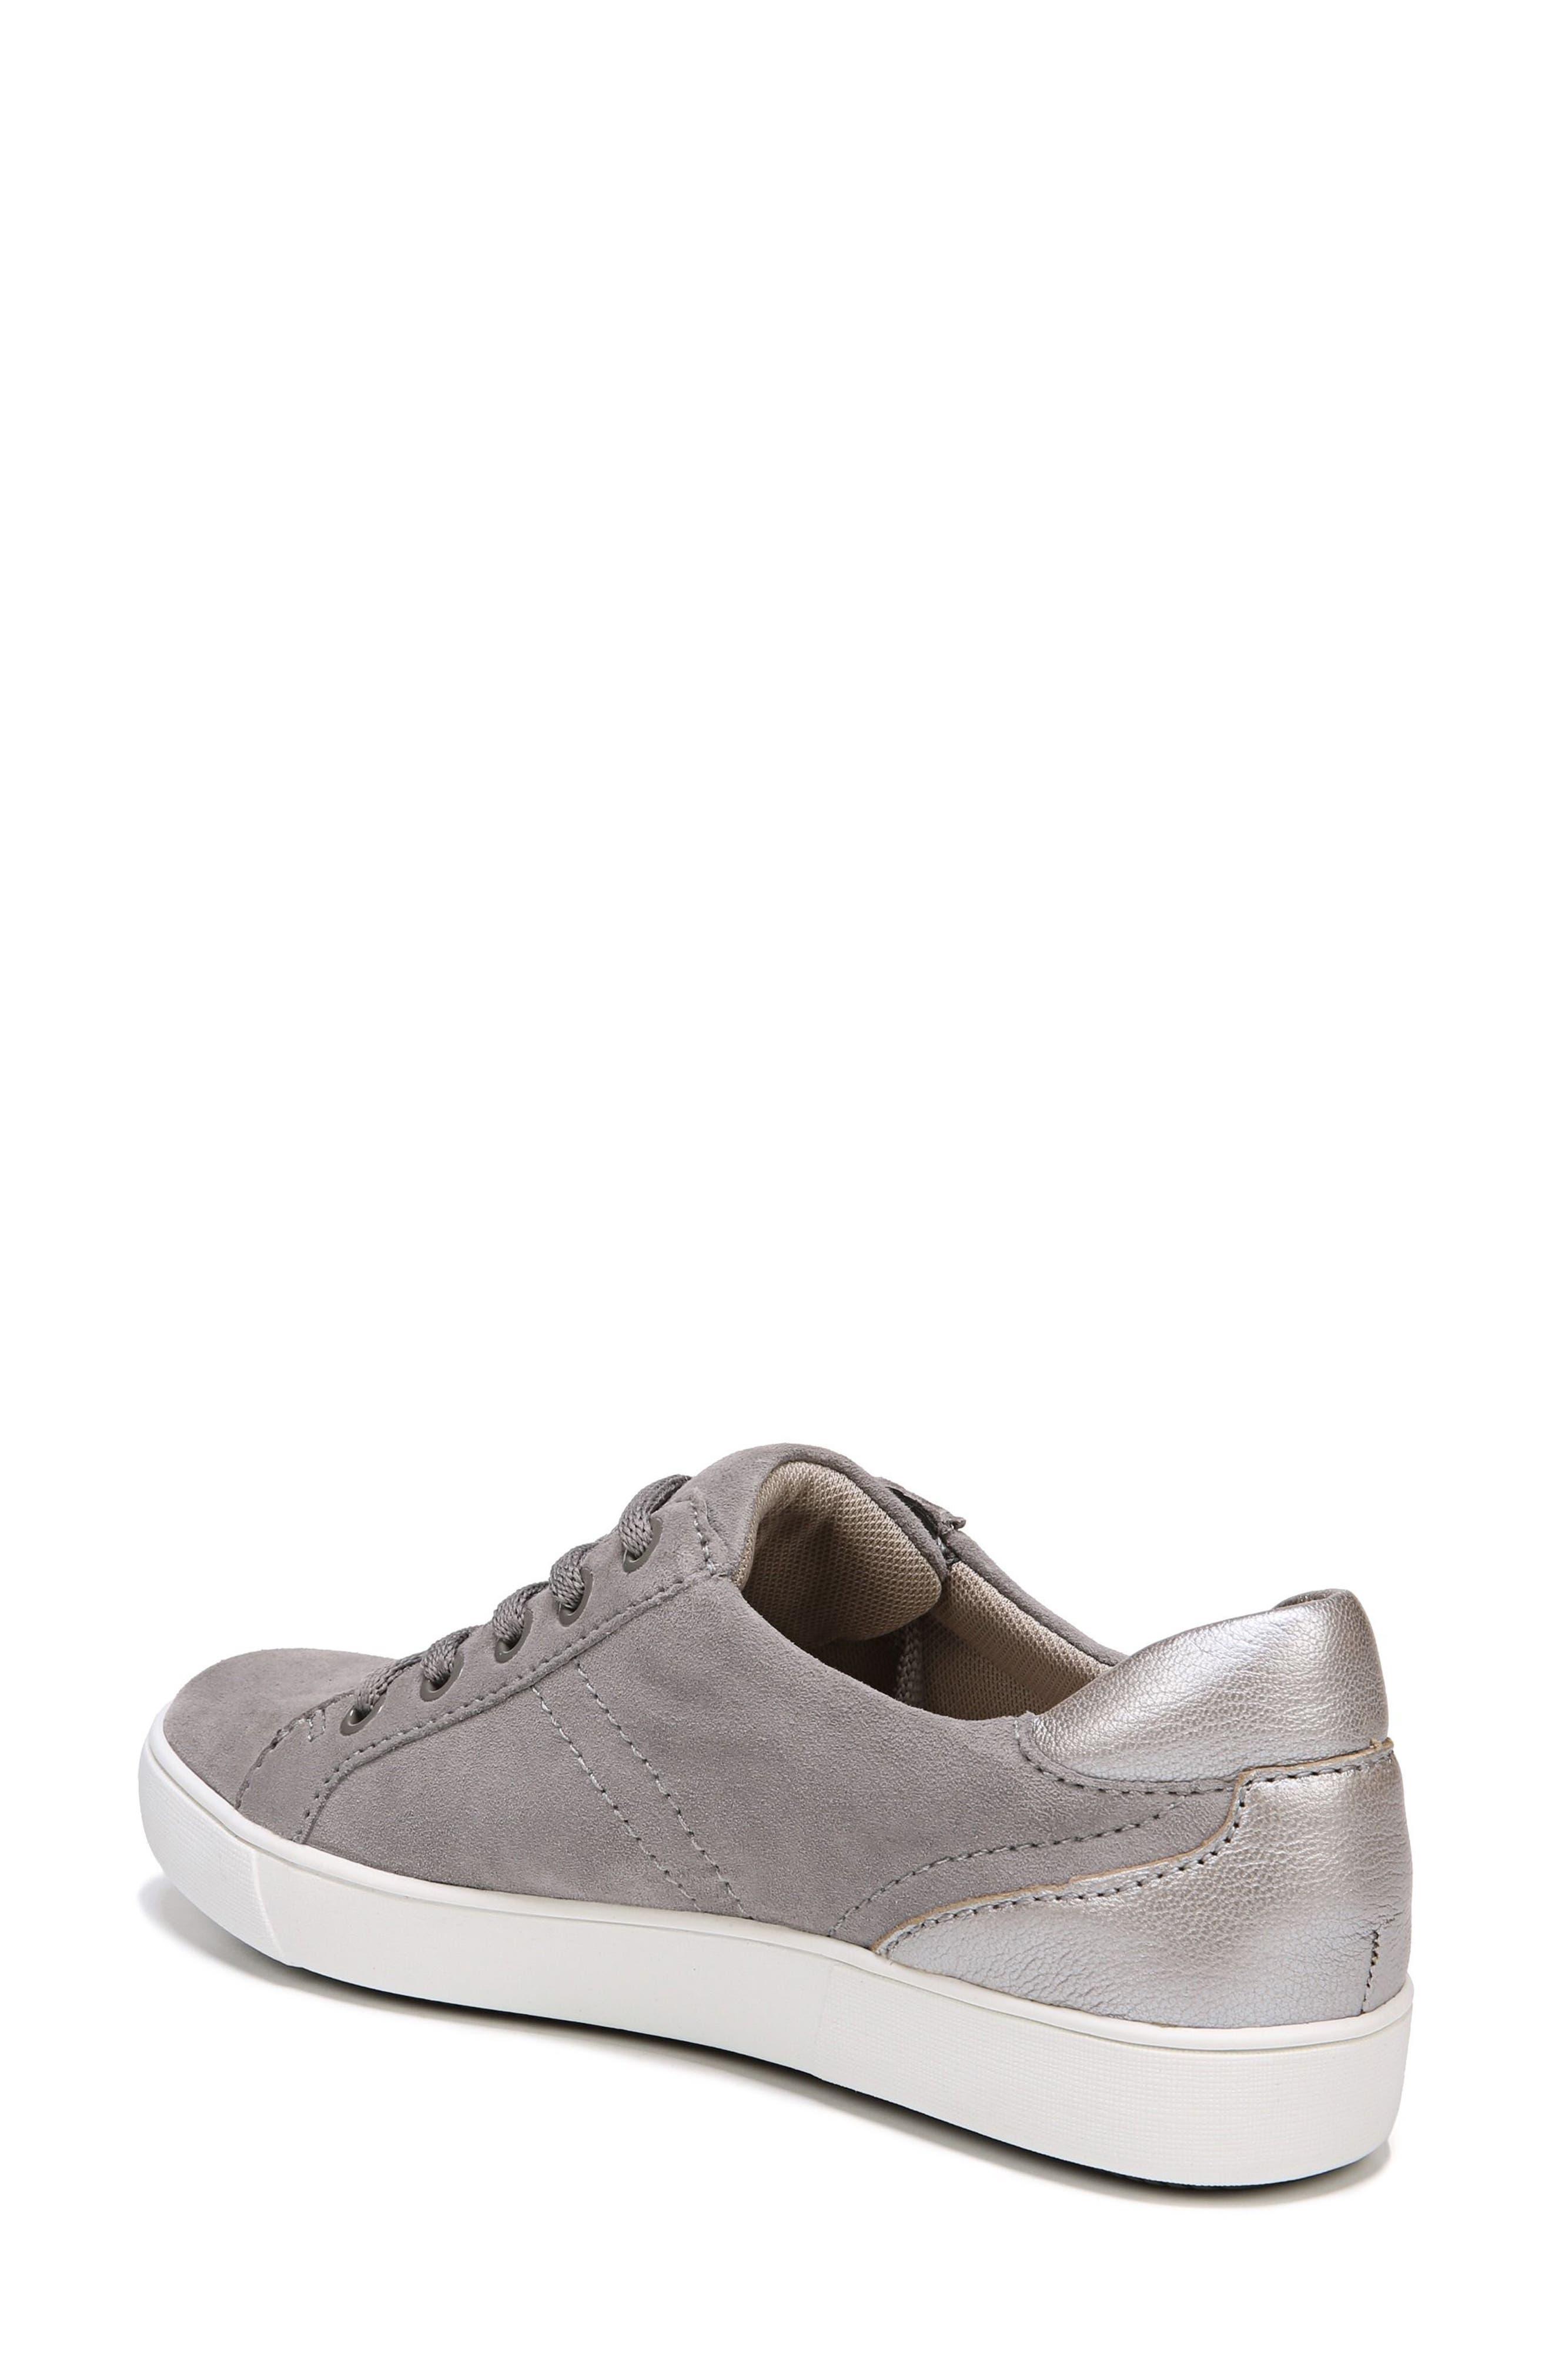 NATURALIZER, Morrison Sneaker, Alternate thumbnail 2, color, GREY SUEDE